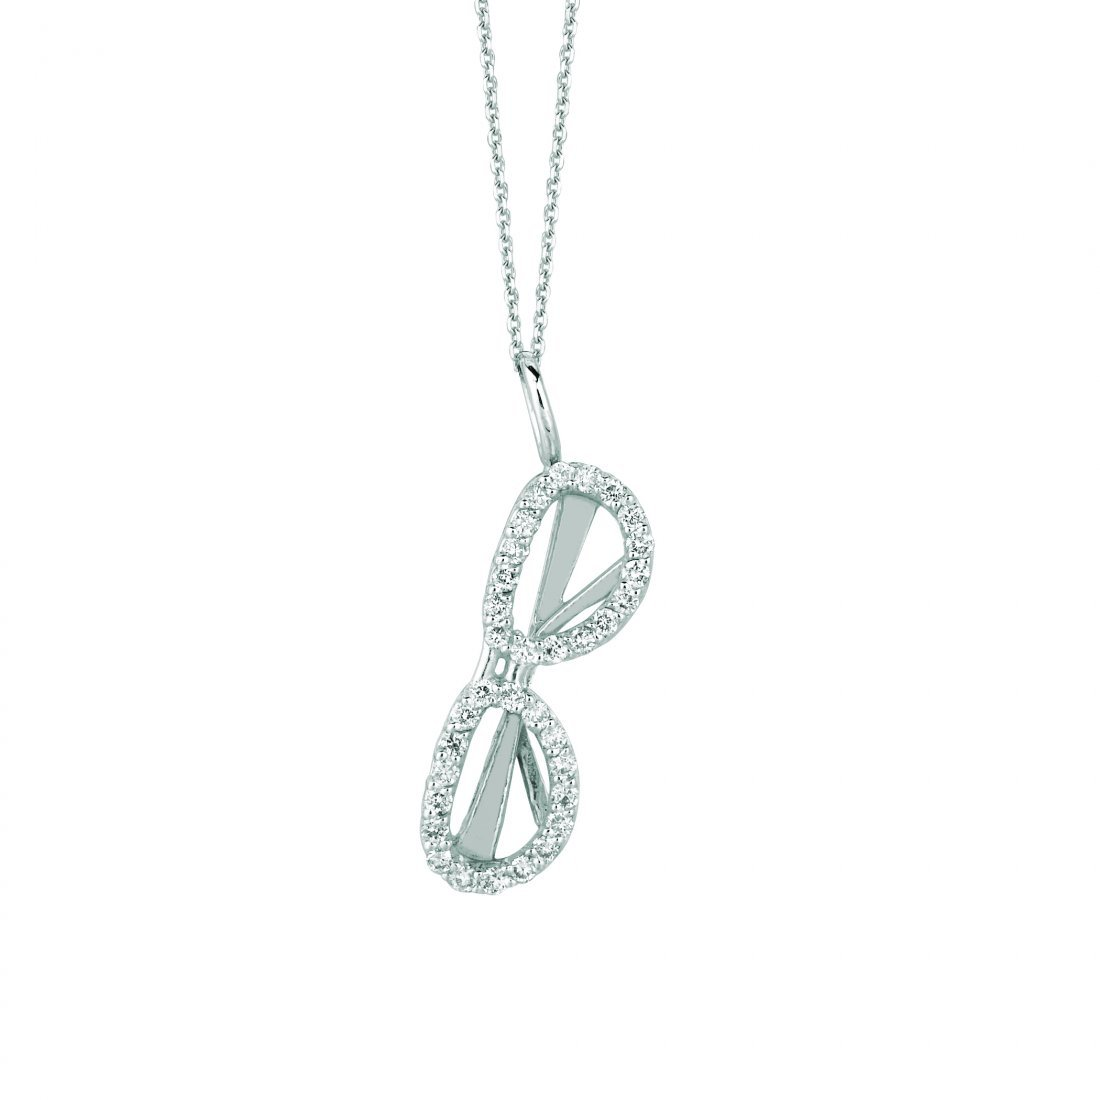 Diamond sunglass necklace